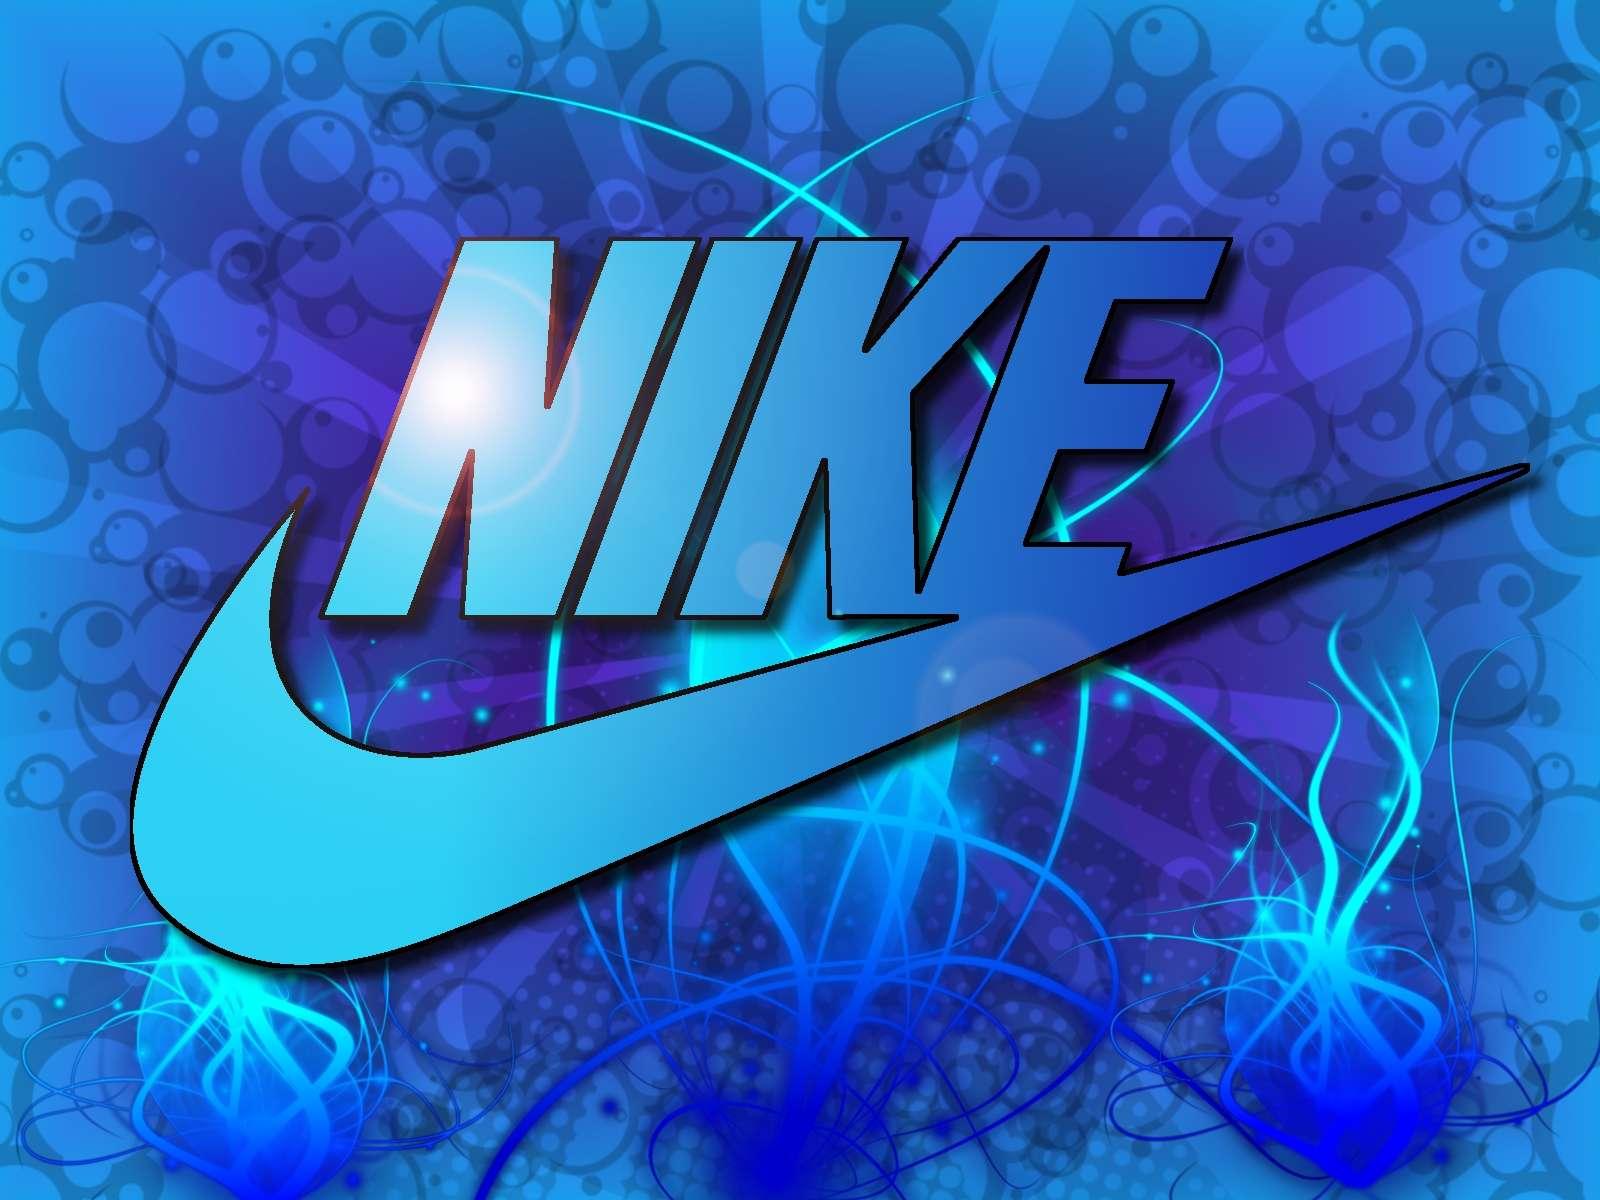 Blue Nike Wallpaper 1600x1200